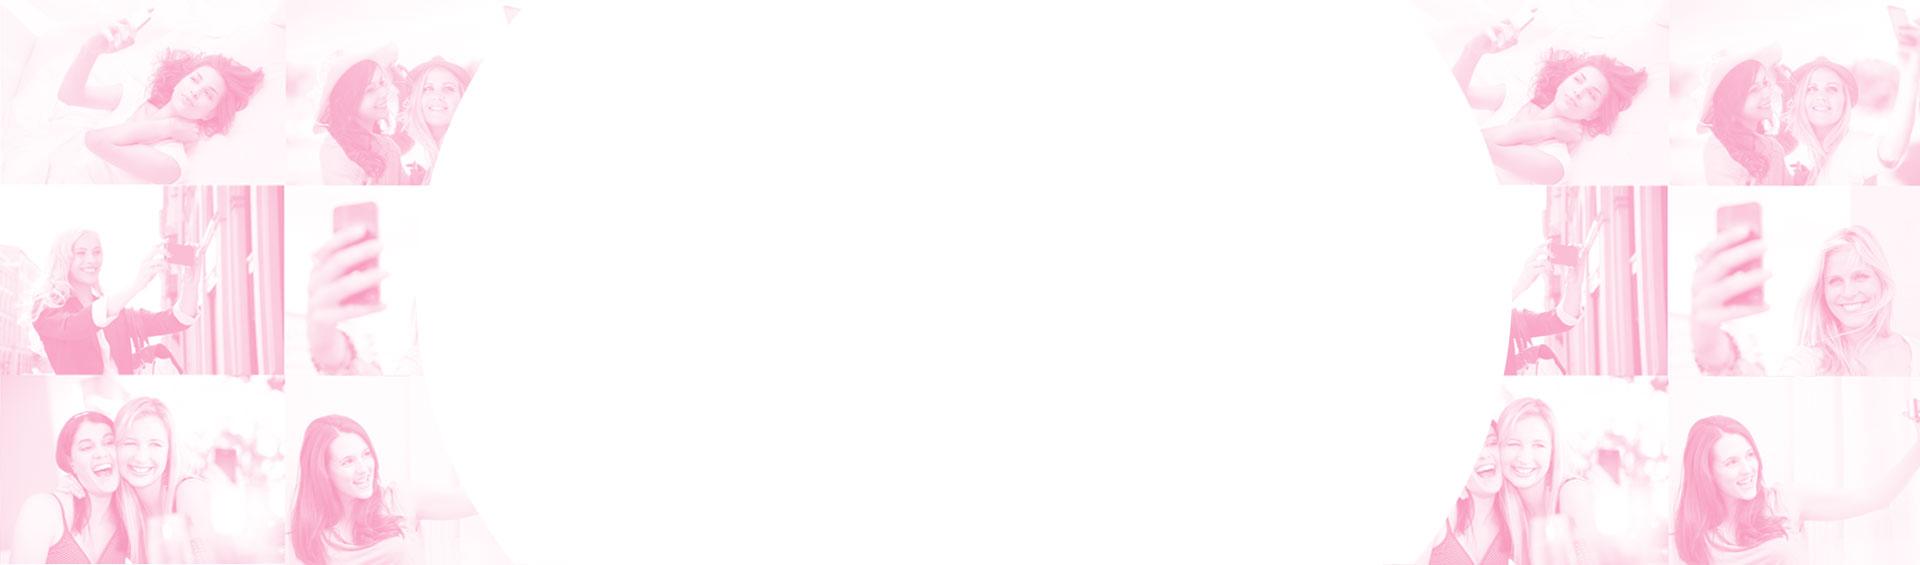 50 Tons Mais Escuros Download Torrent sitemap